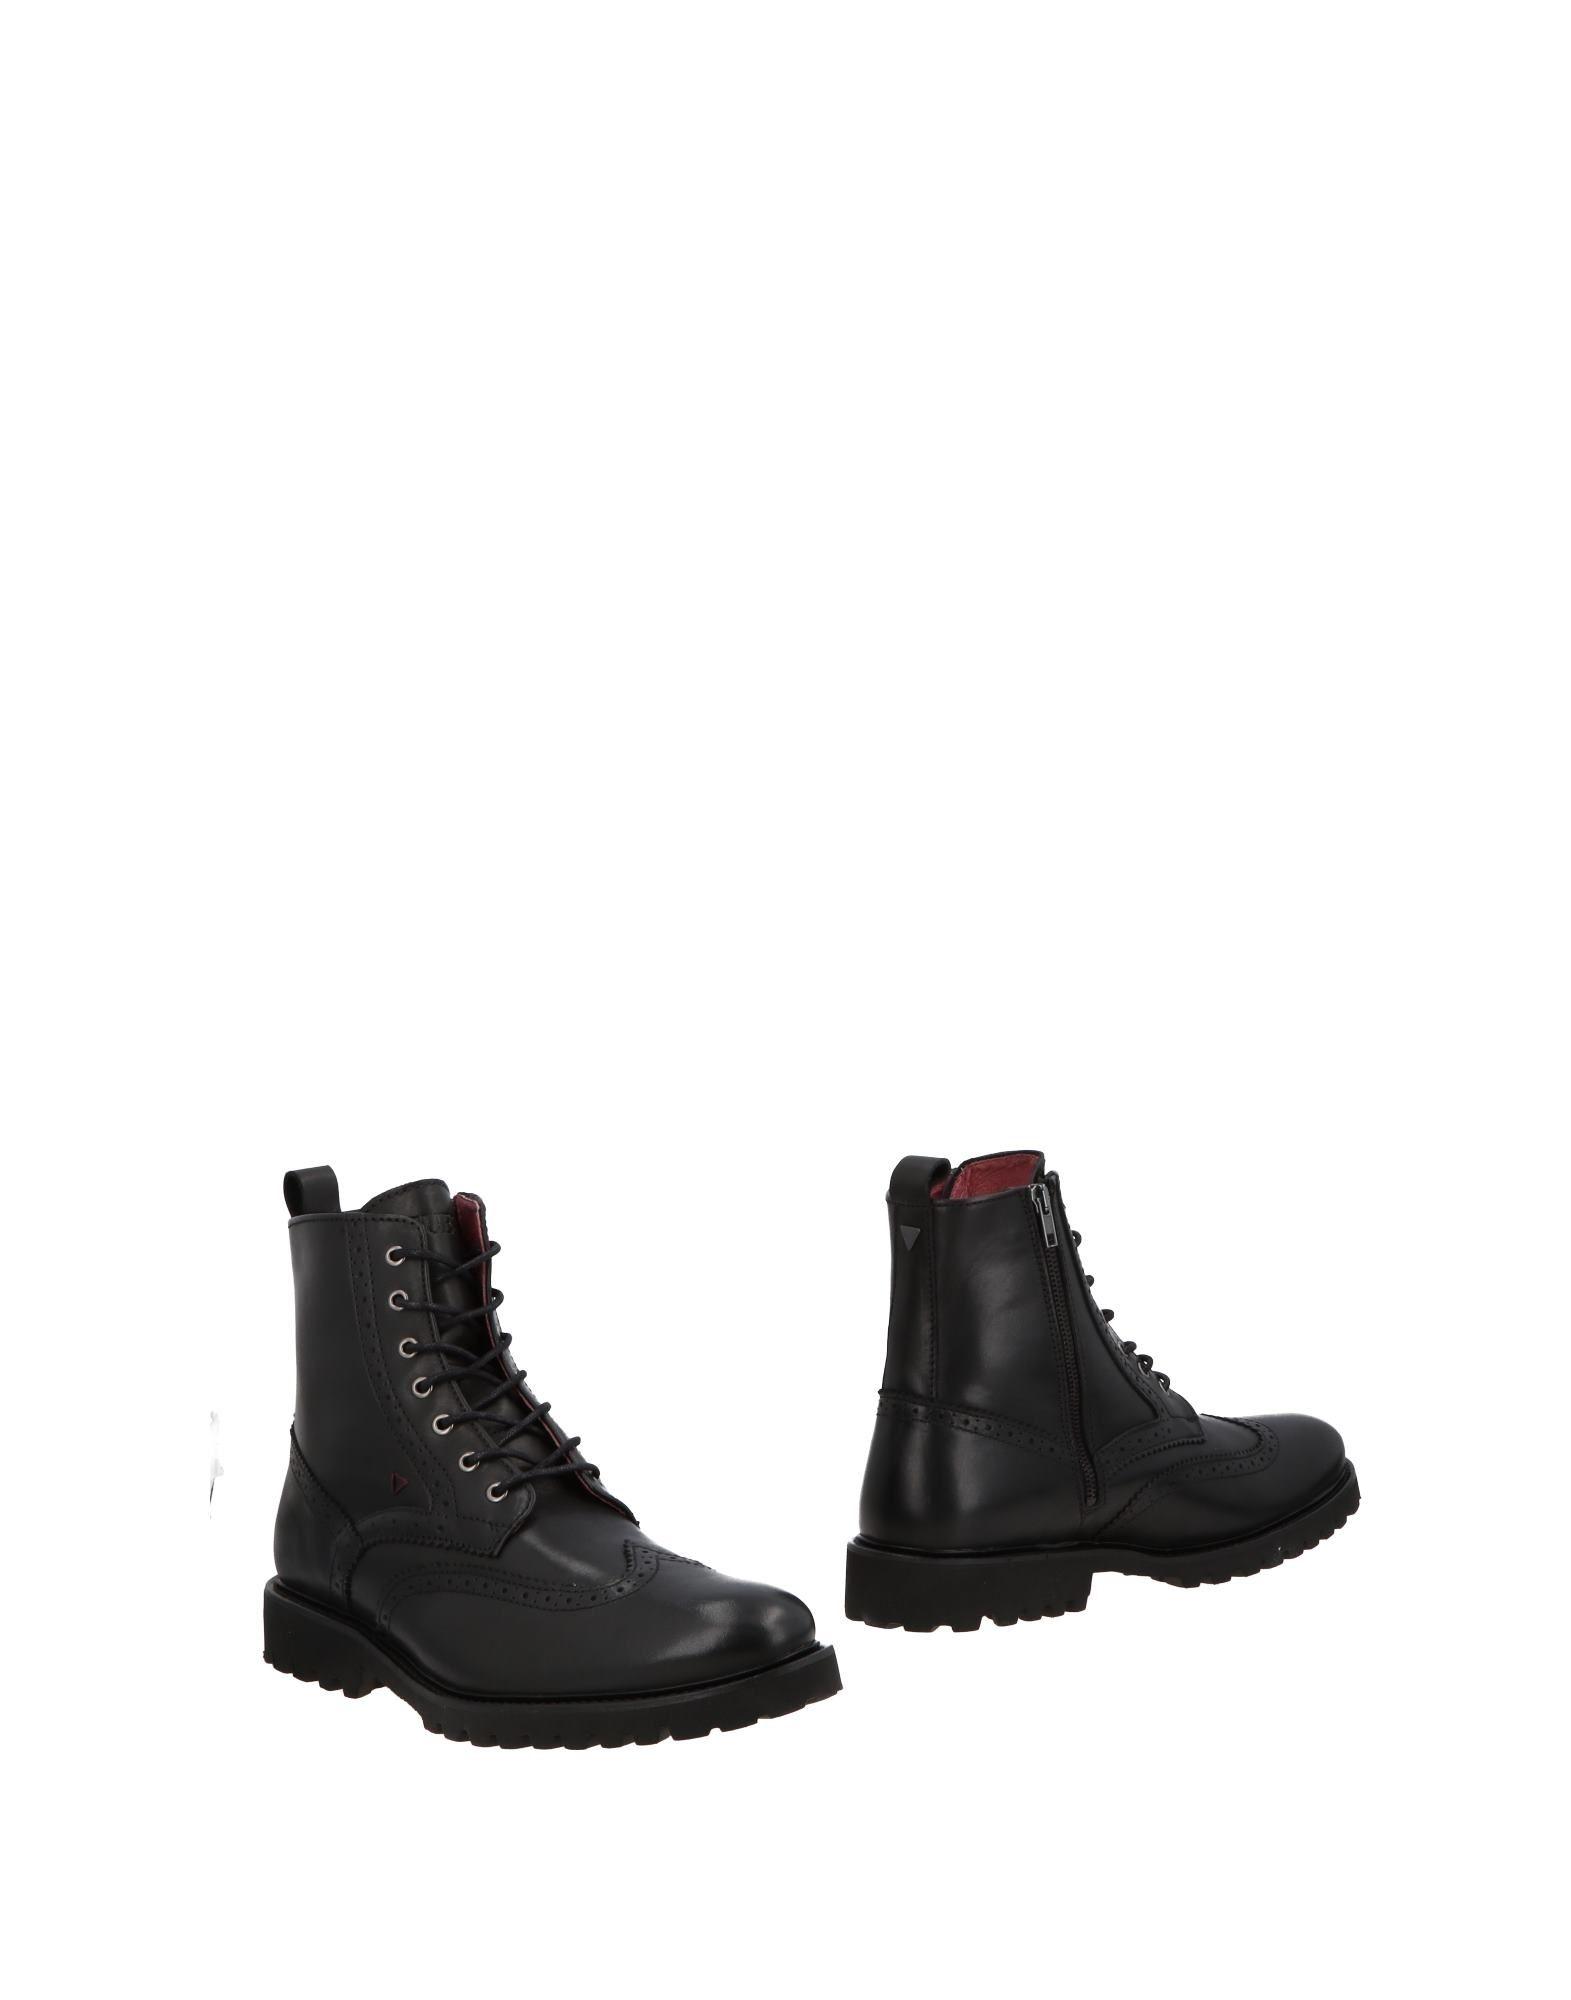 Rabatt echte Schuhe Guess Stiefelette Herren  11492995JH